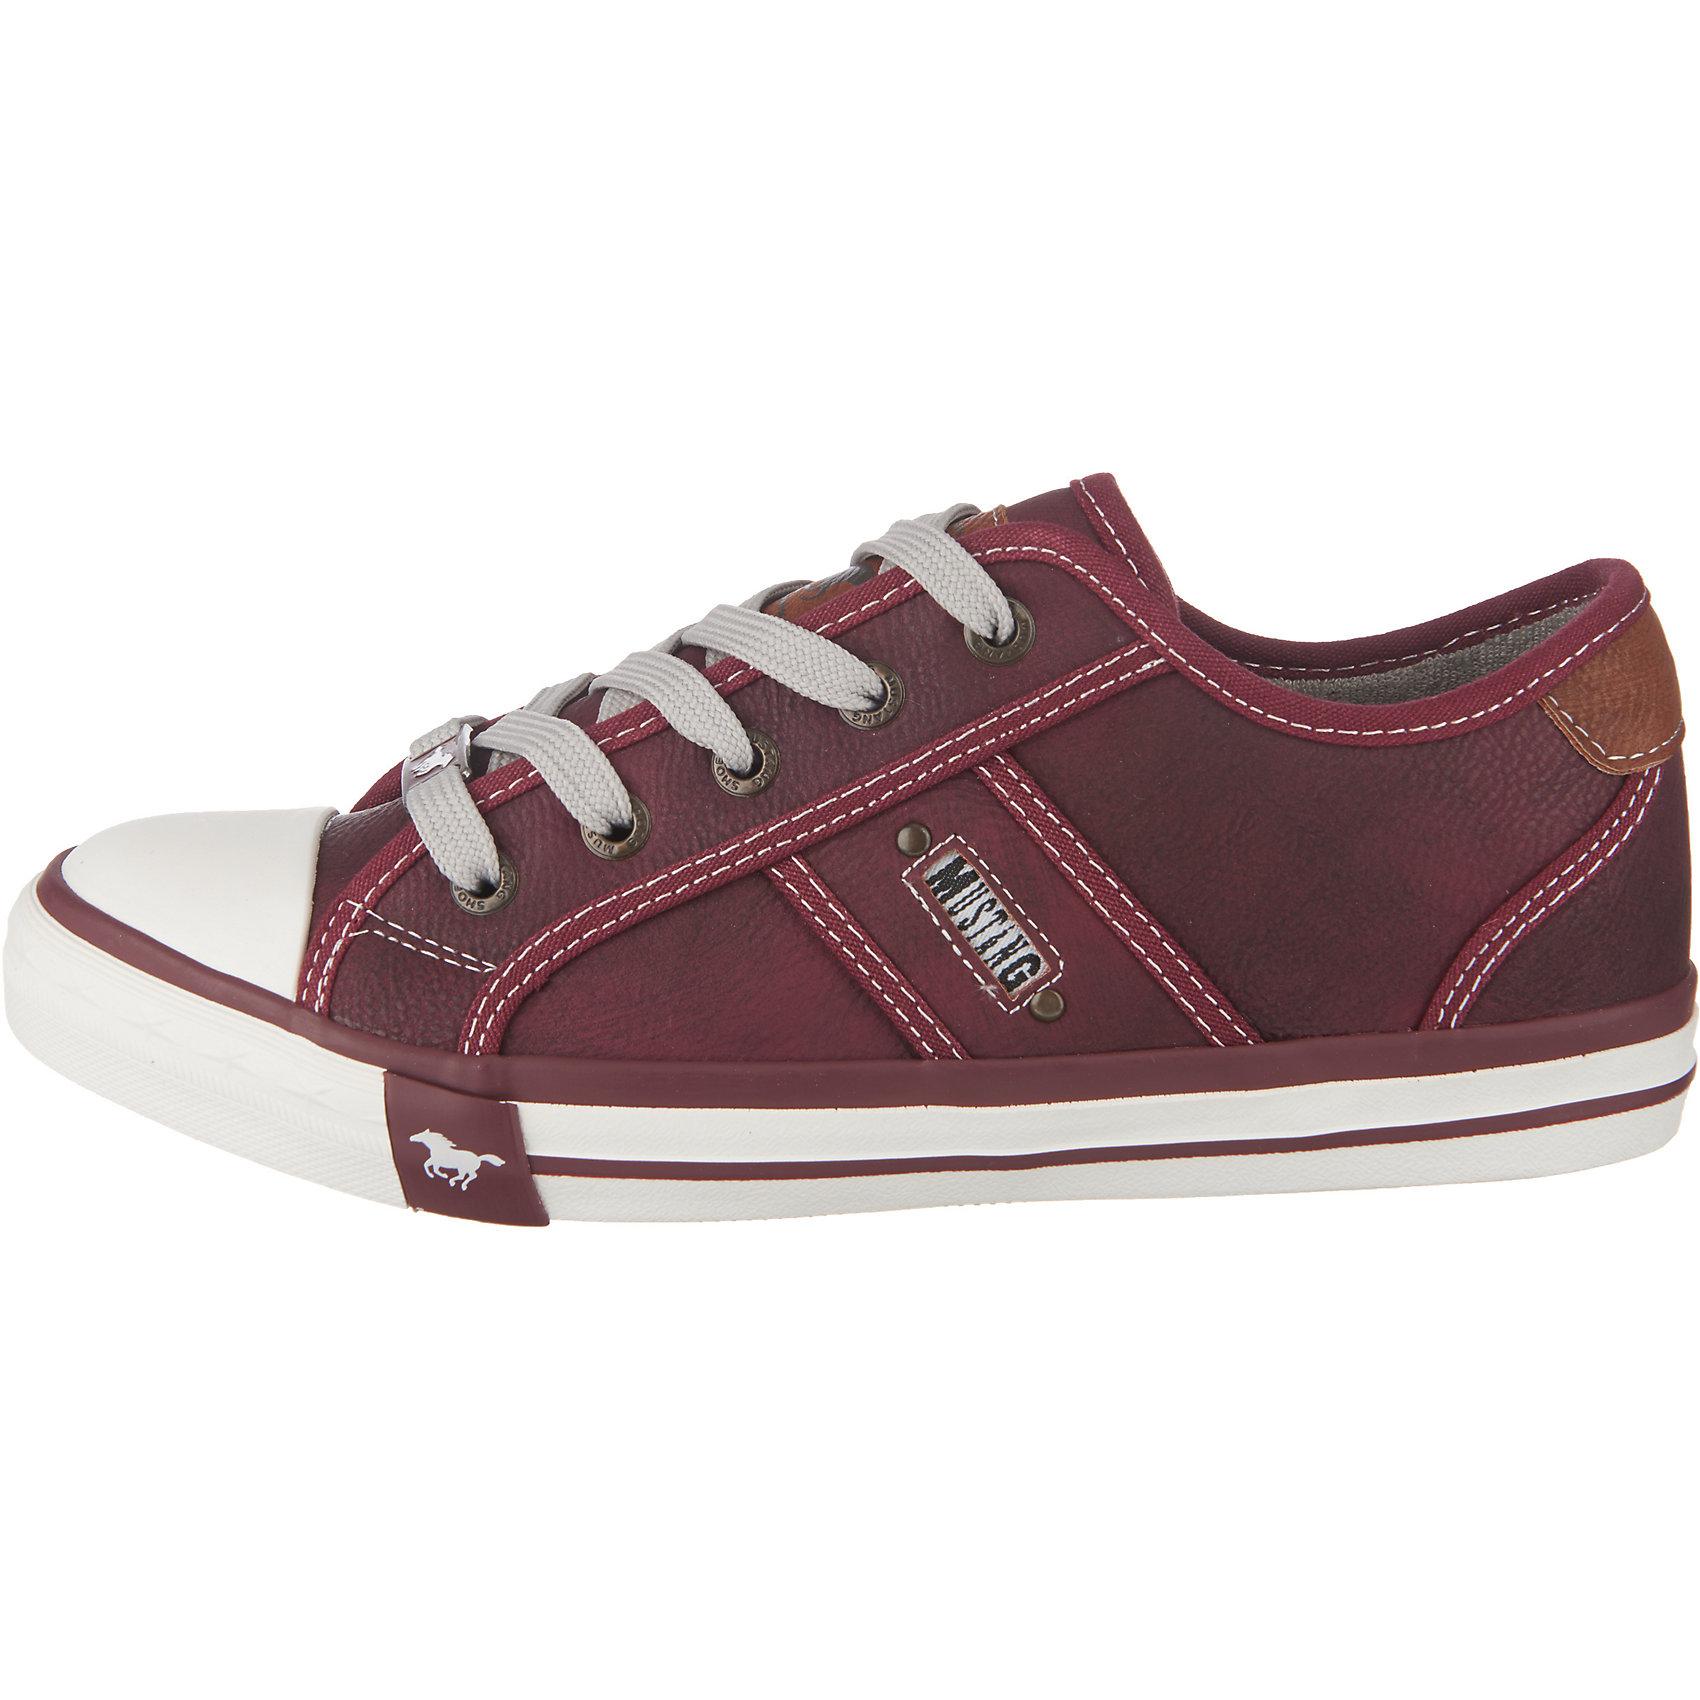 84663d423541cf Neu MUSTANG Sneakers Low 5749161 für Damen dunkelblau cognac ...